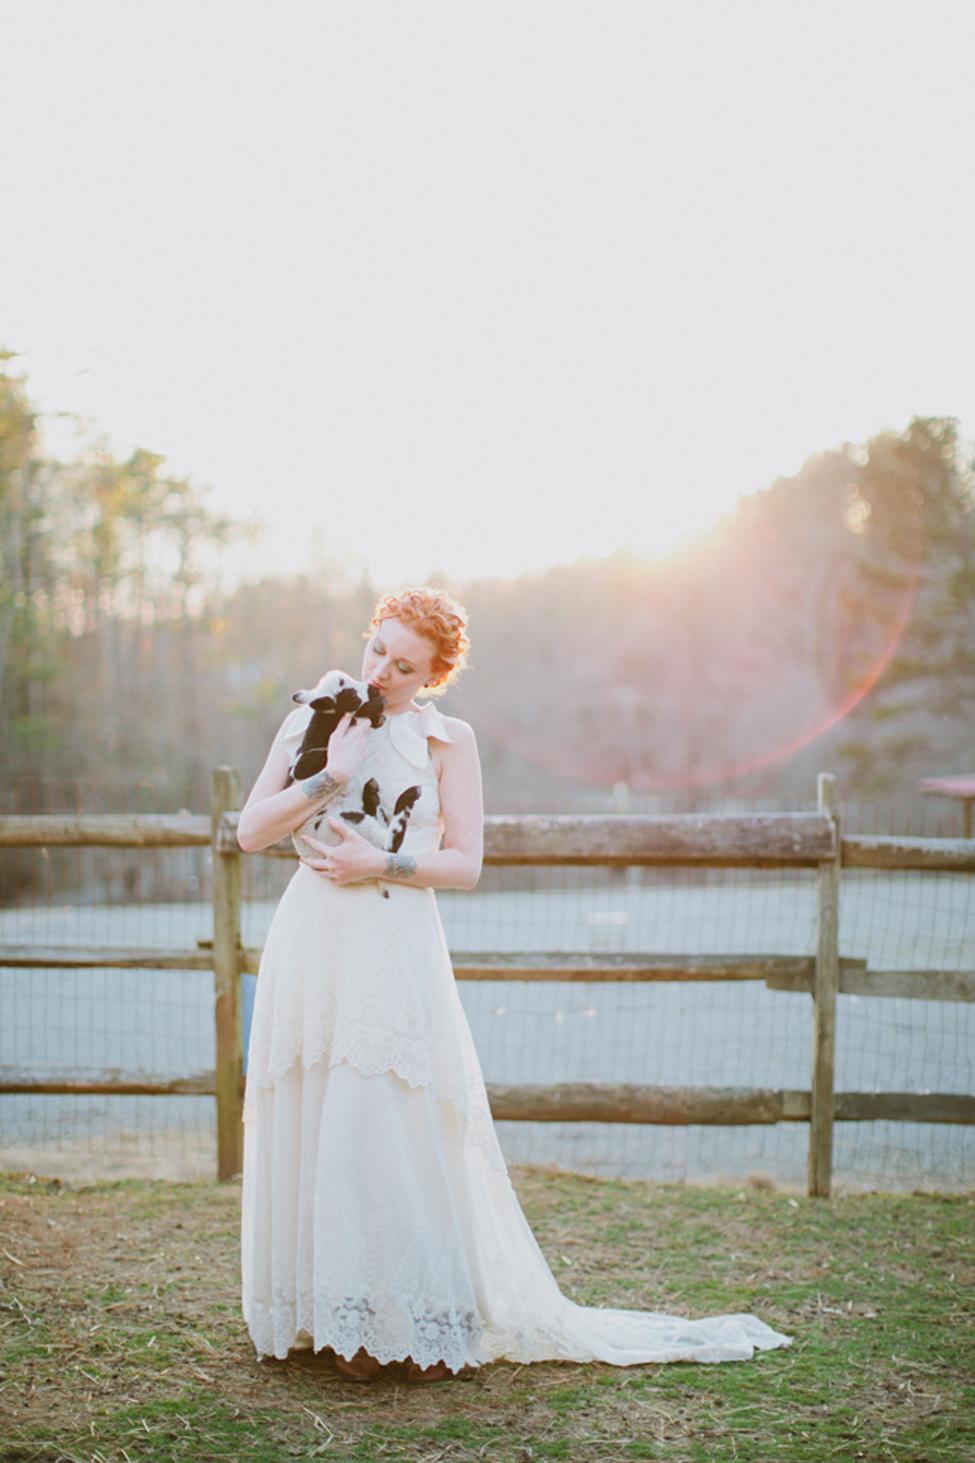 jameykay_arlie_folk_farm_wedding107.jpg